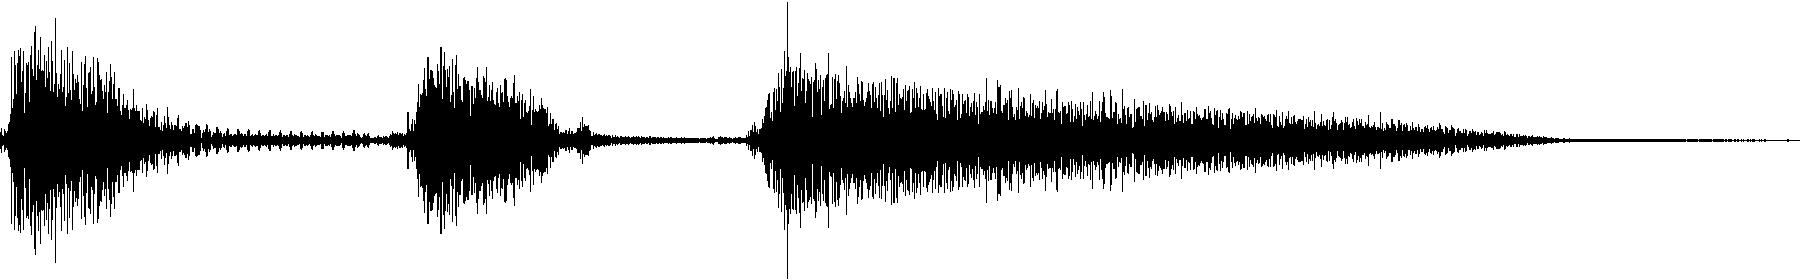 114 jazz guit e